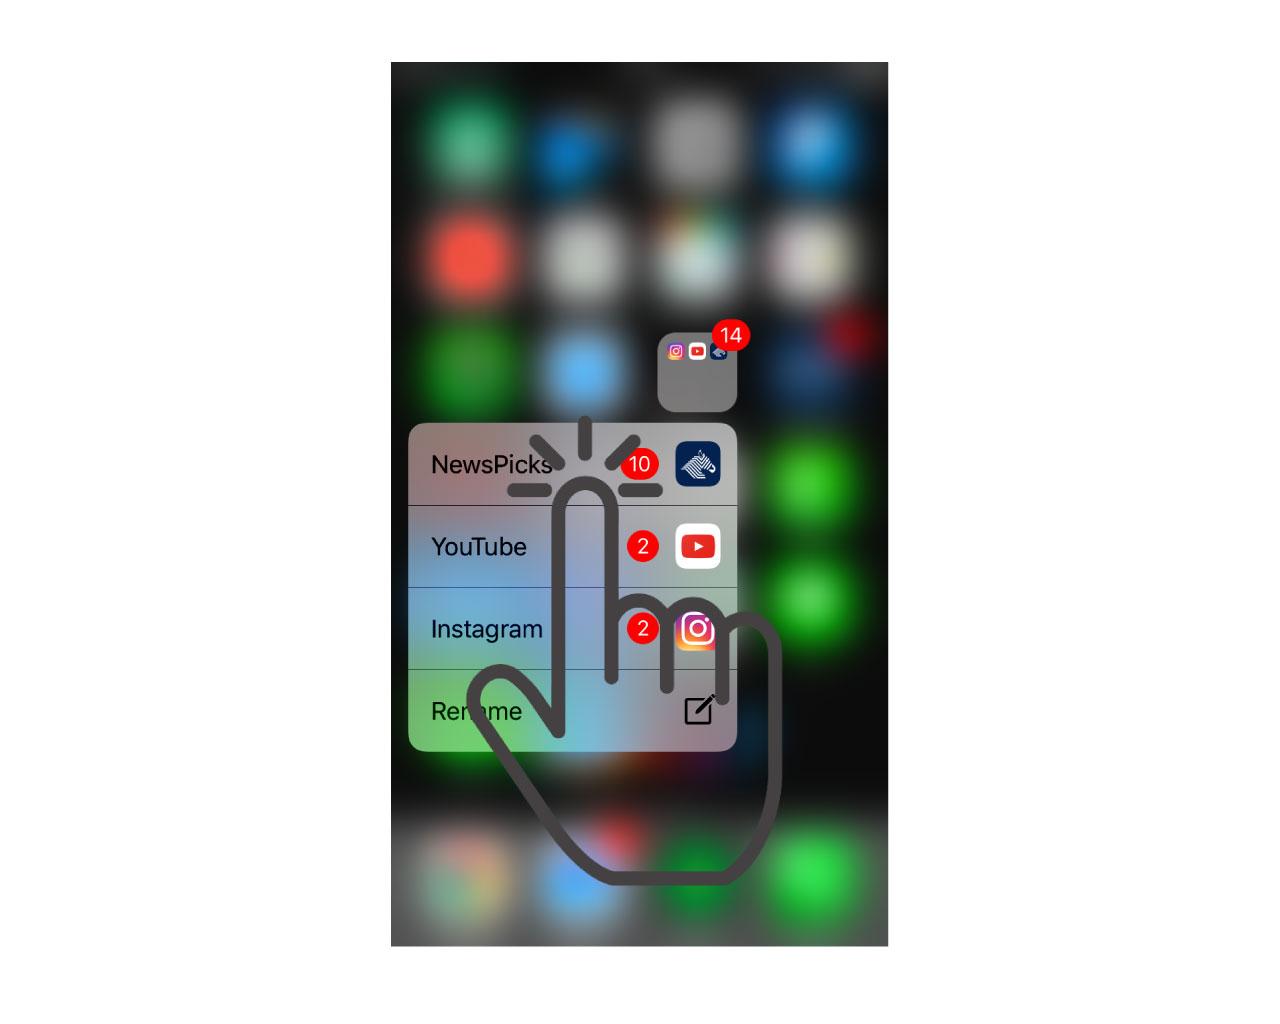 iphone-3dtouch-app-folder-badge-1